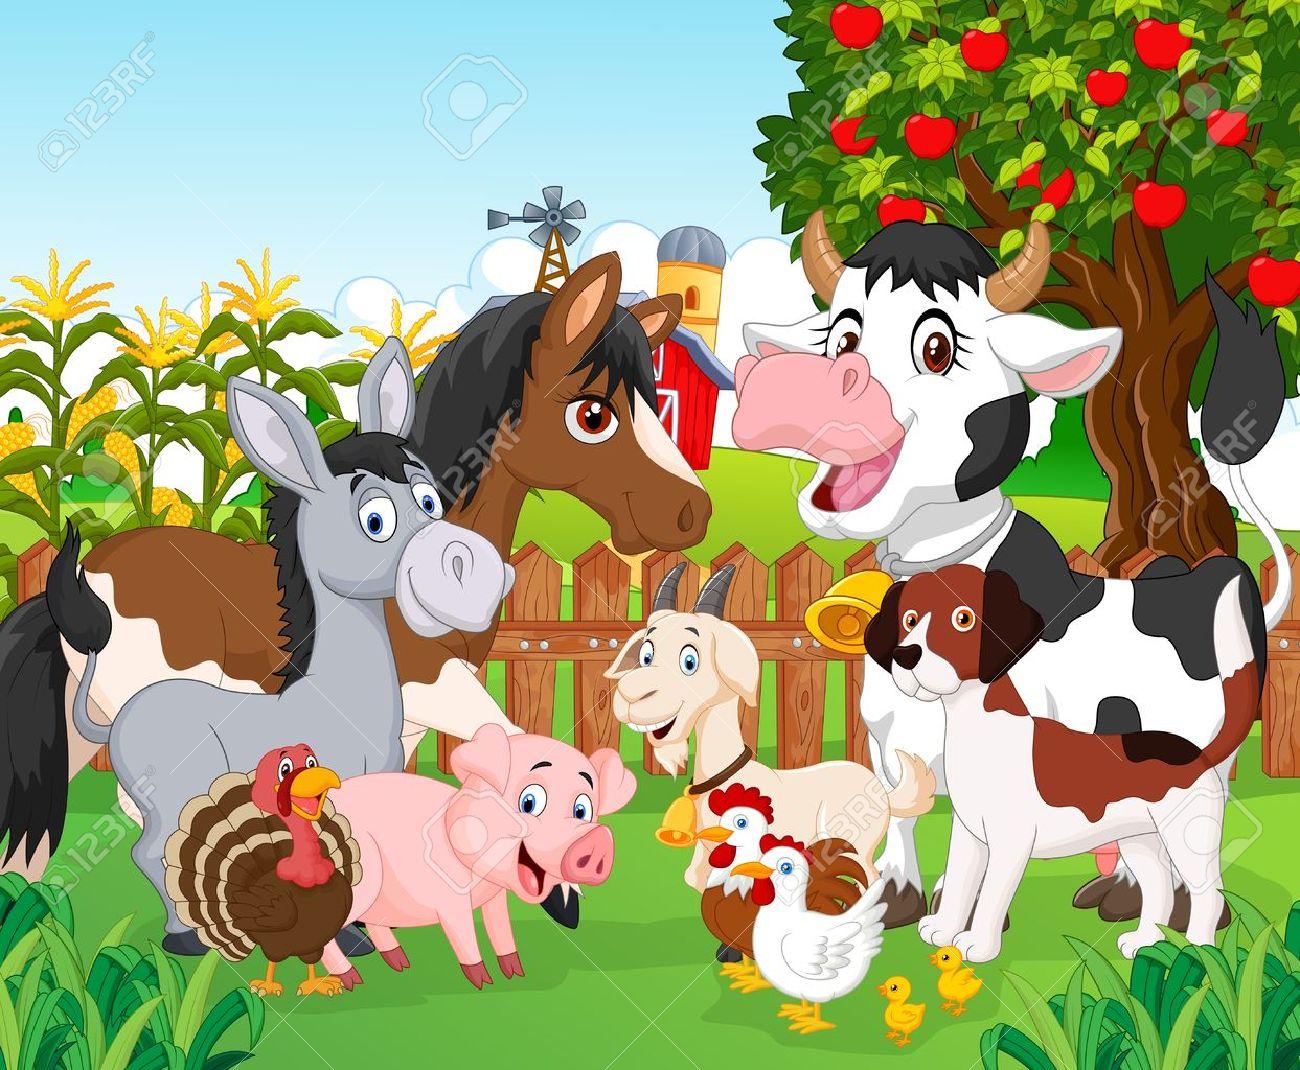 Cartoon cute animal Stock Vector - 45092467